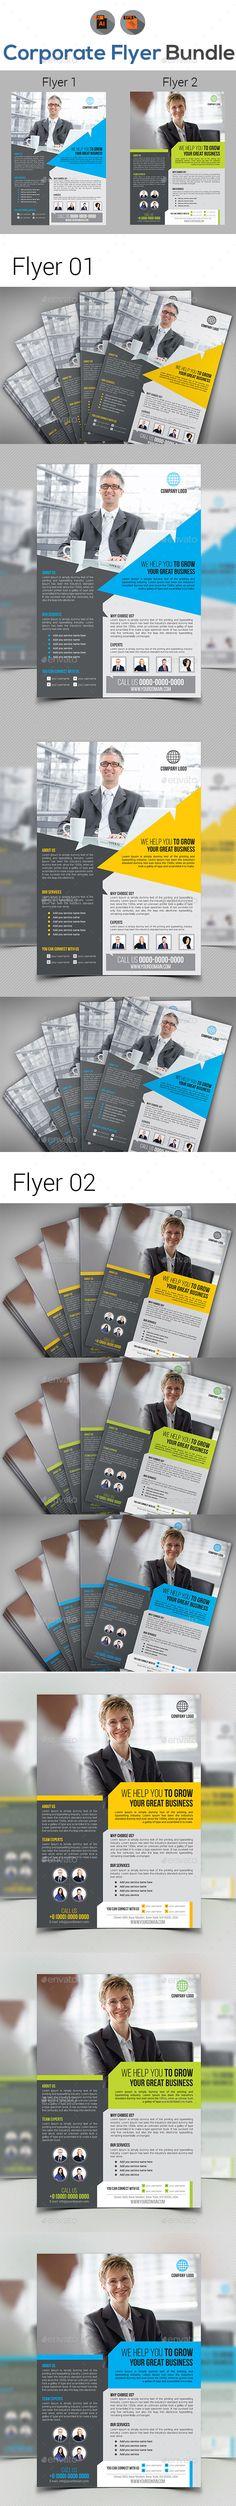 Company Business Profile Design Item, Designs and Business - company business profile